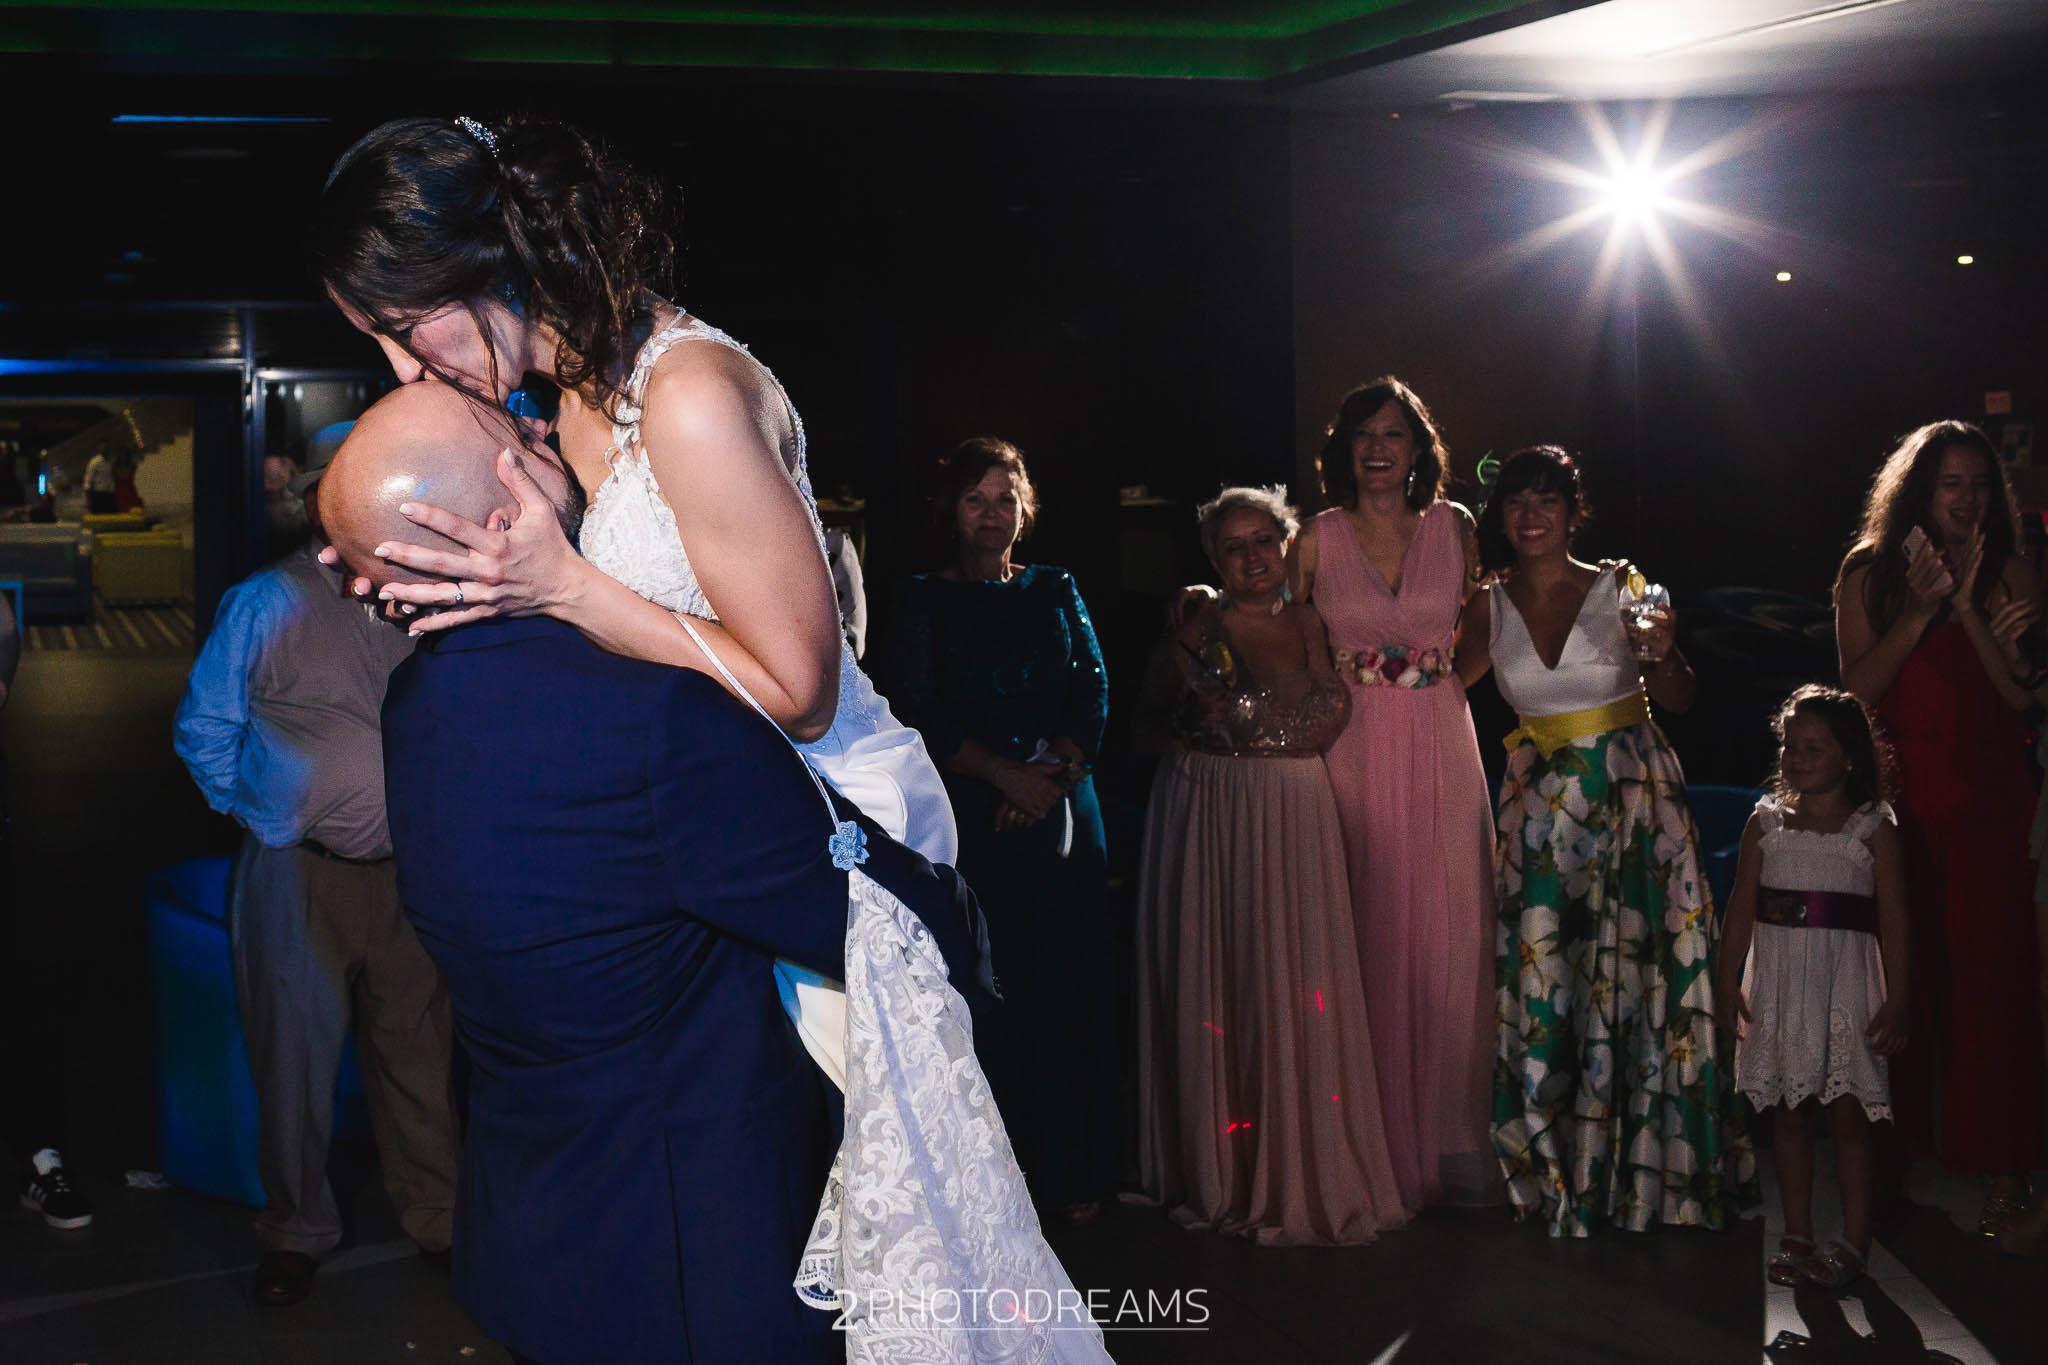 Wedding Photos at Hotel Taurito Princess in Gran Canaria Mariajo & Iván